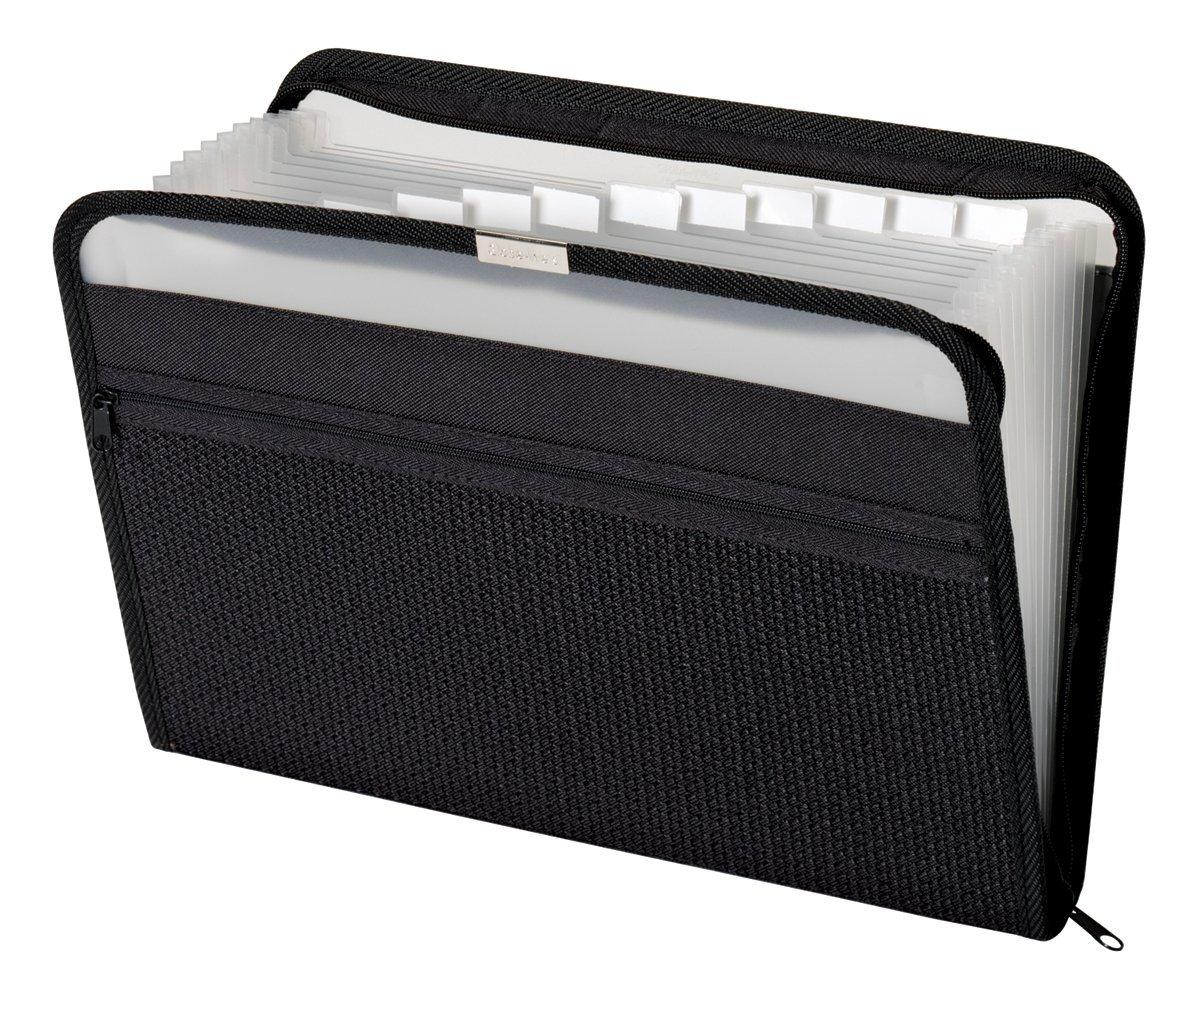 Globe-Weis/Pendaflex 13-Pocket Fabric Expanding Zip File, Letter Size, Pack of 6, Black (84087BLK)